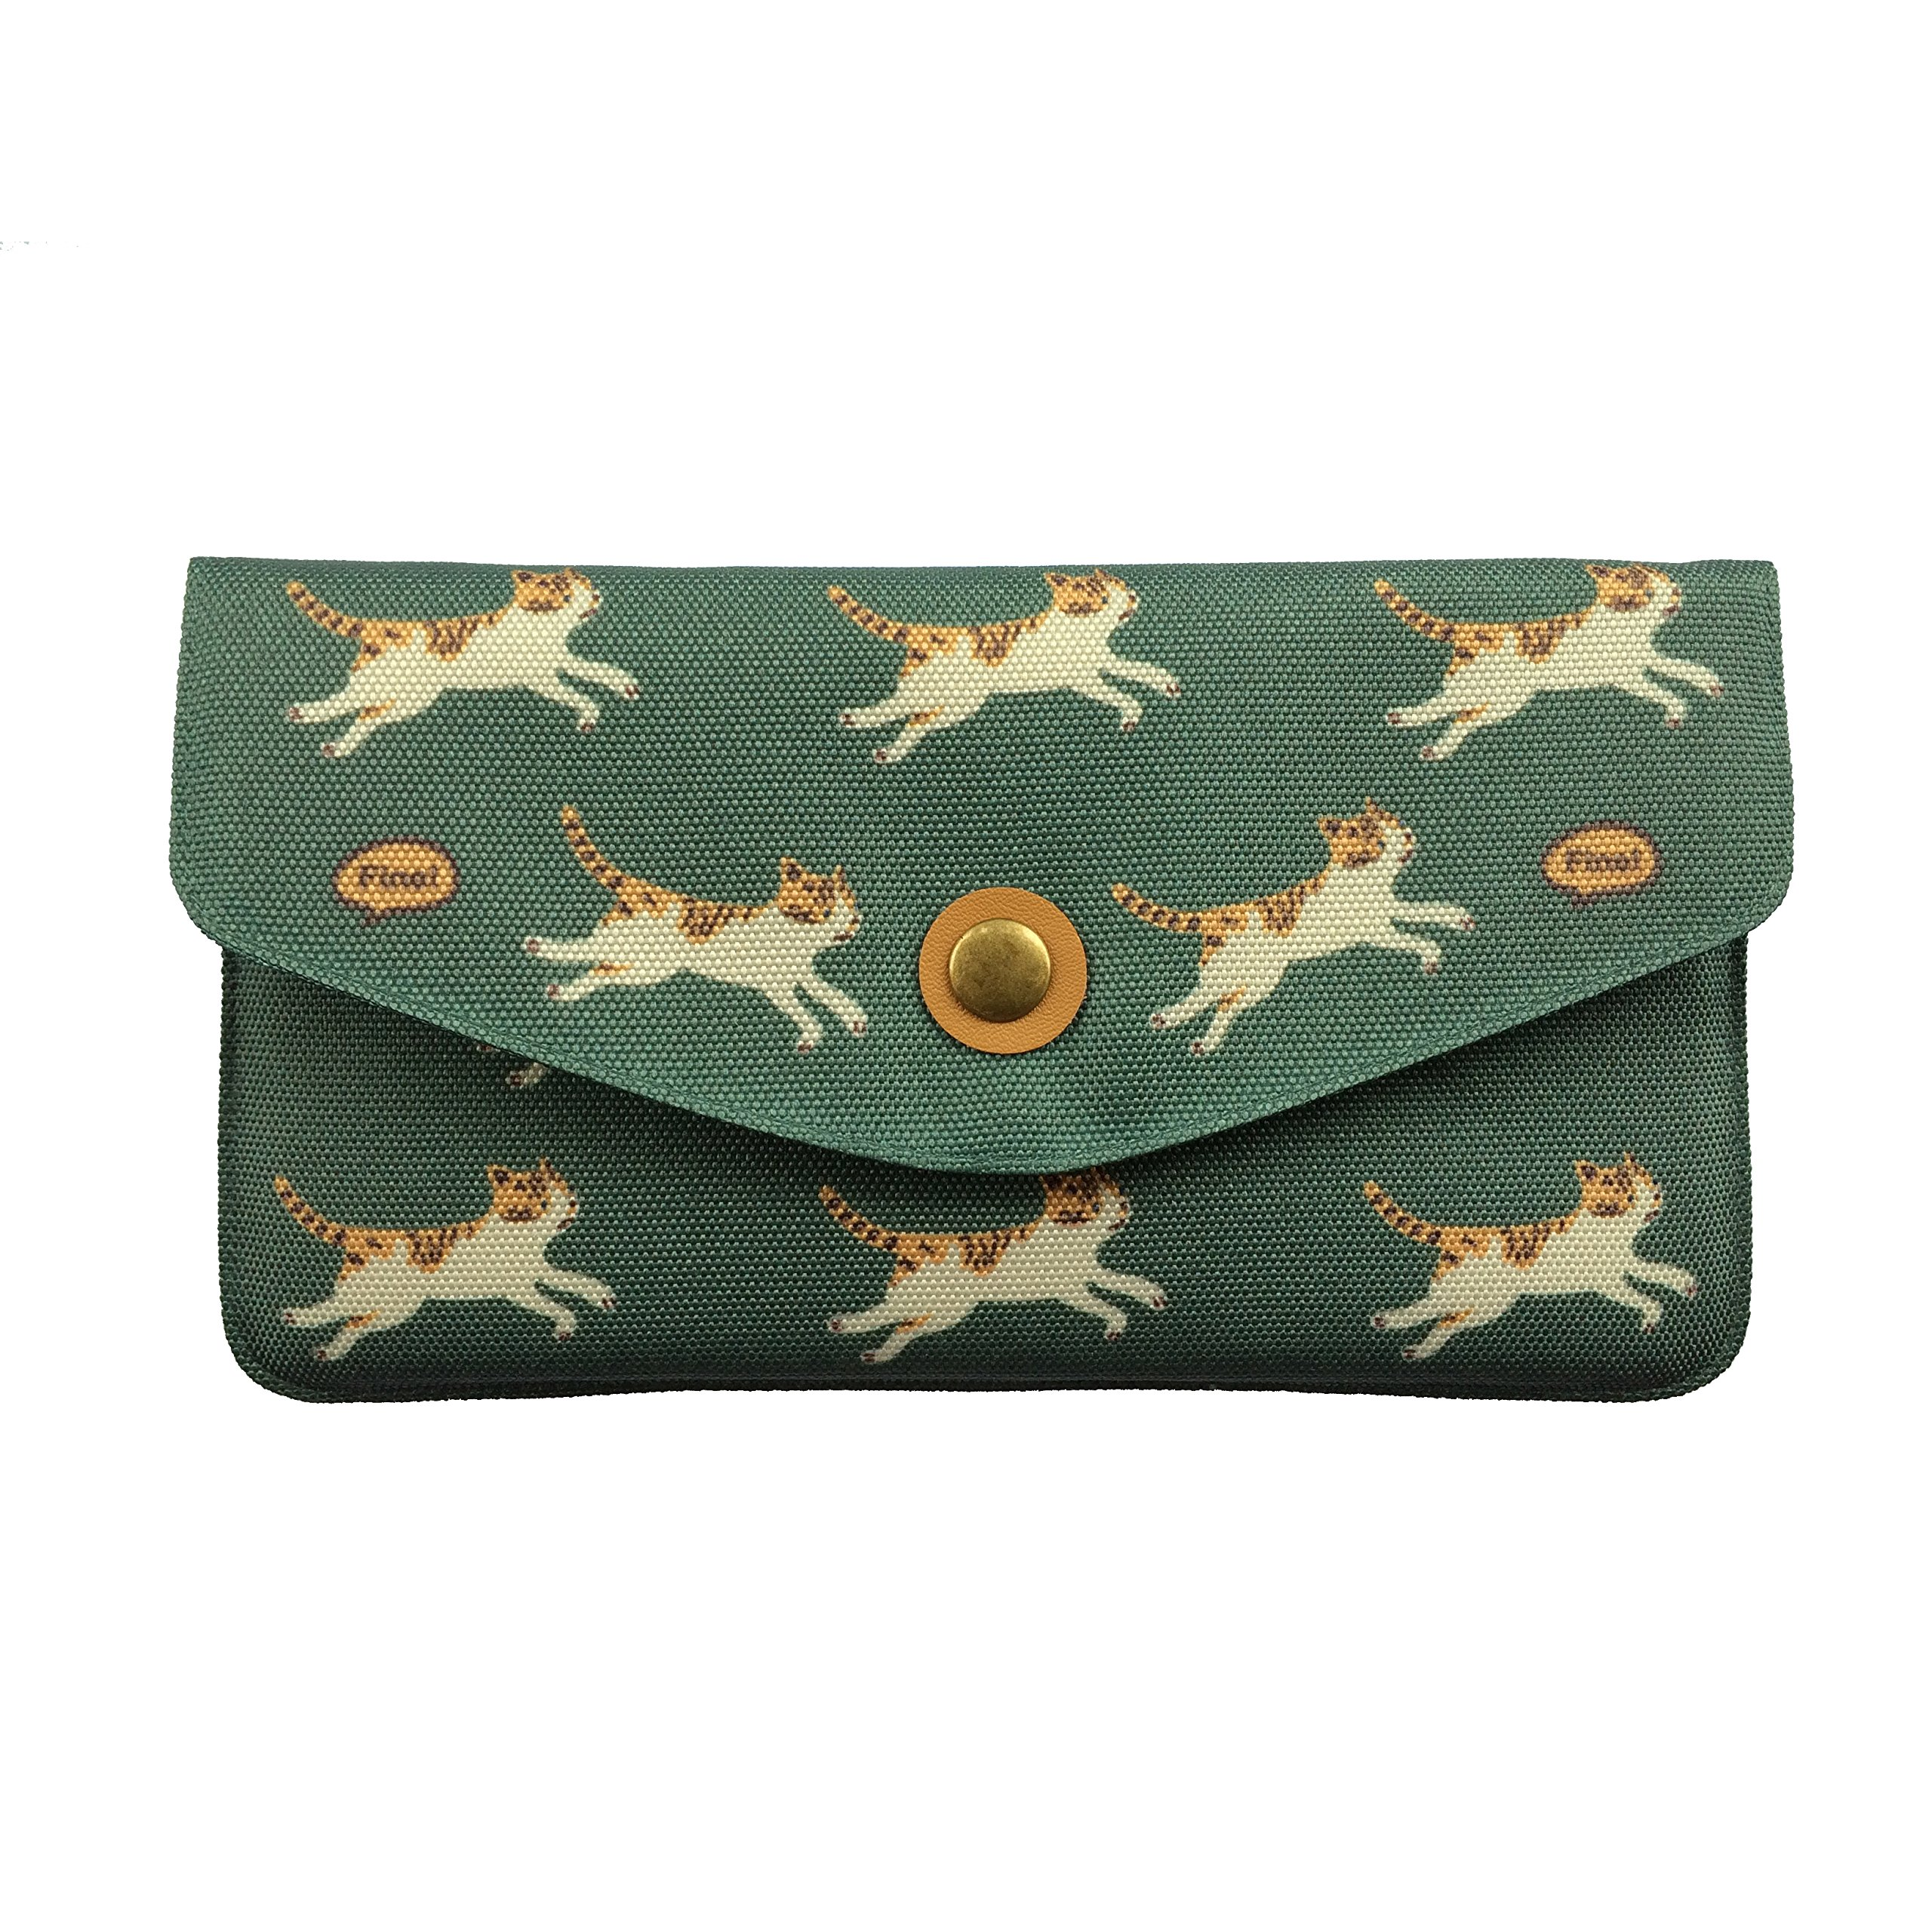 Ulzzang Women's Cloth Cartoon Cat Clutch Wallet (Green)